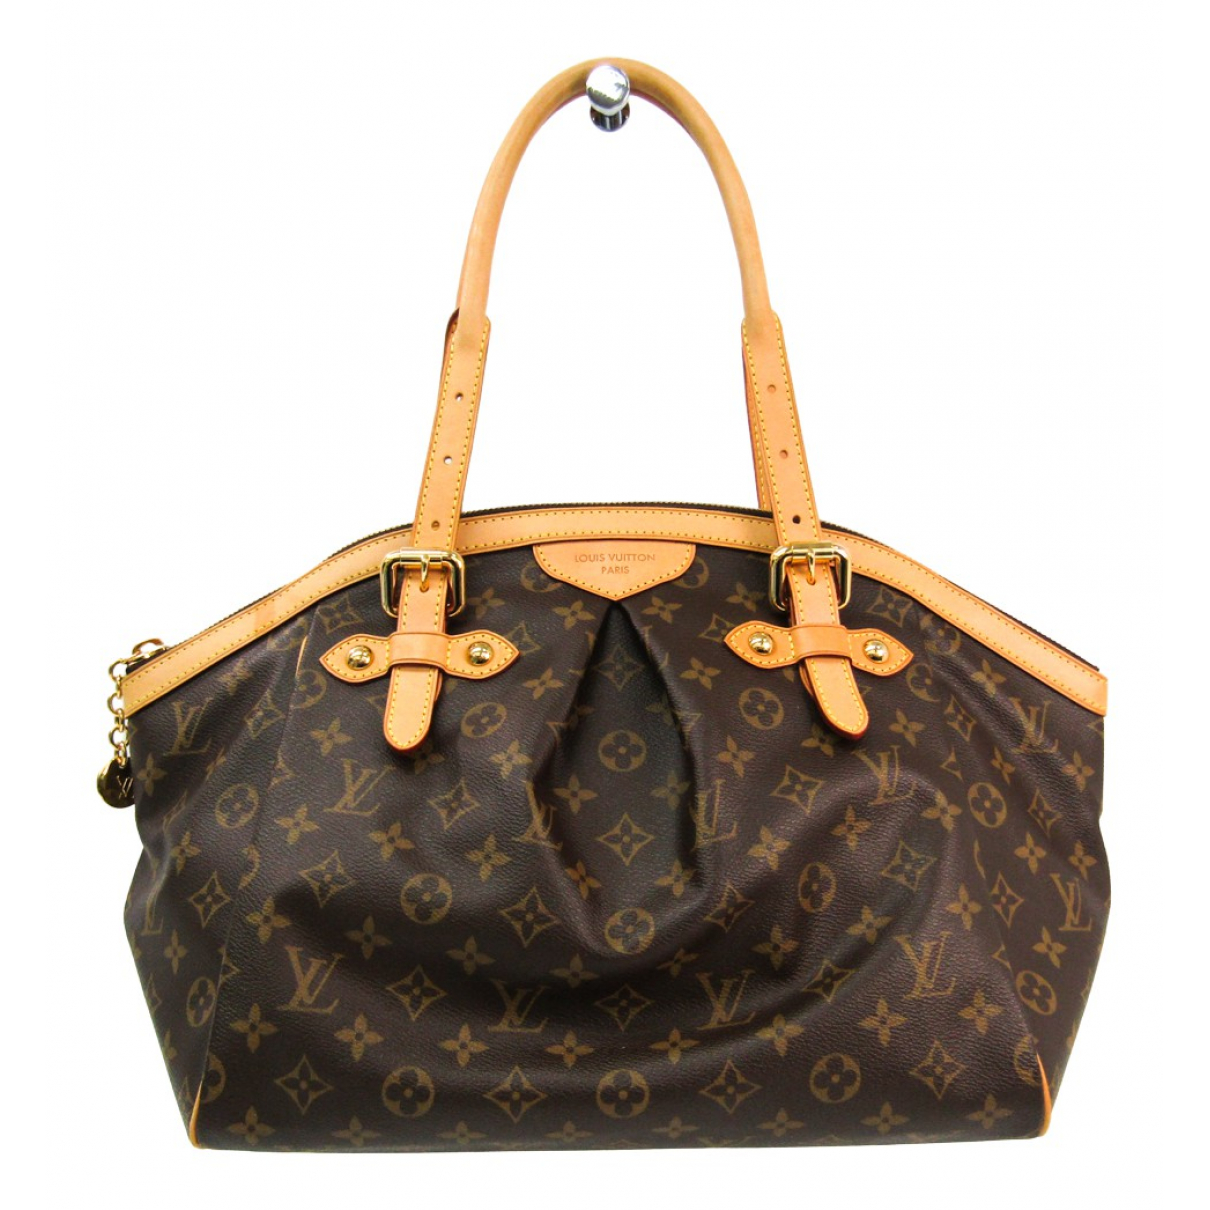 Louis Vuitton Tivoli Brown Cloth handbag for Women N